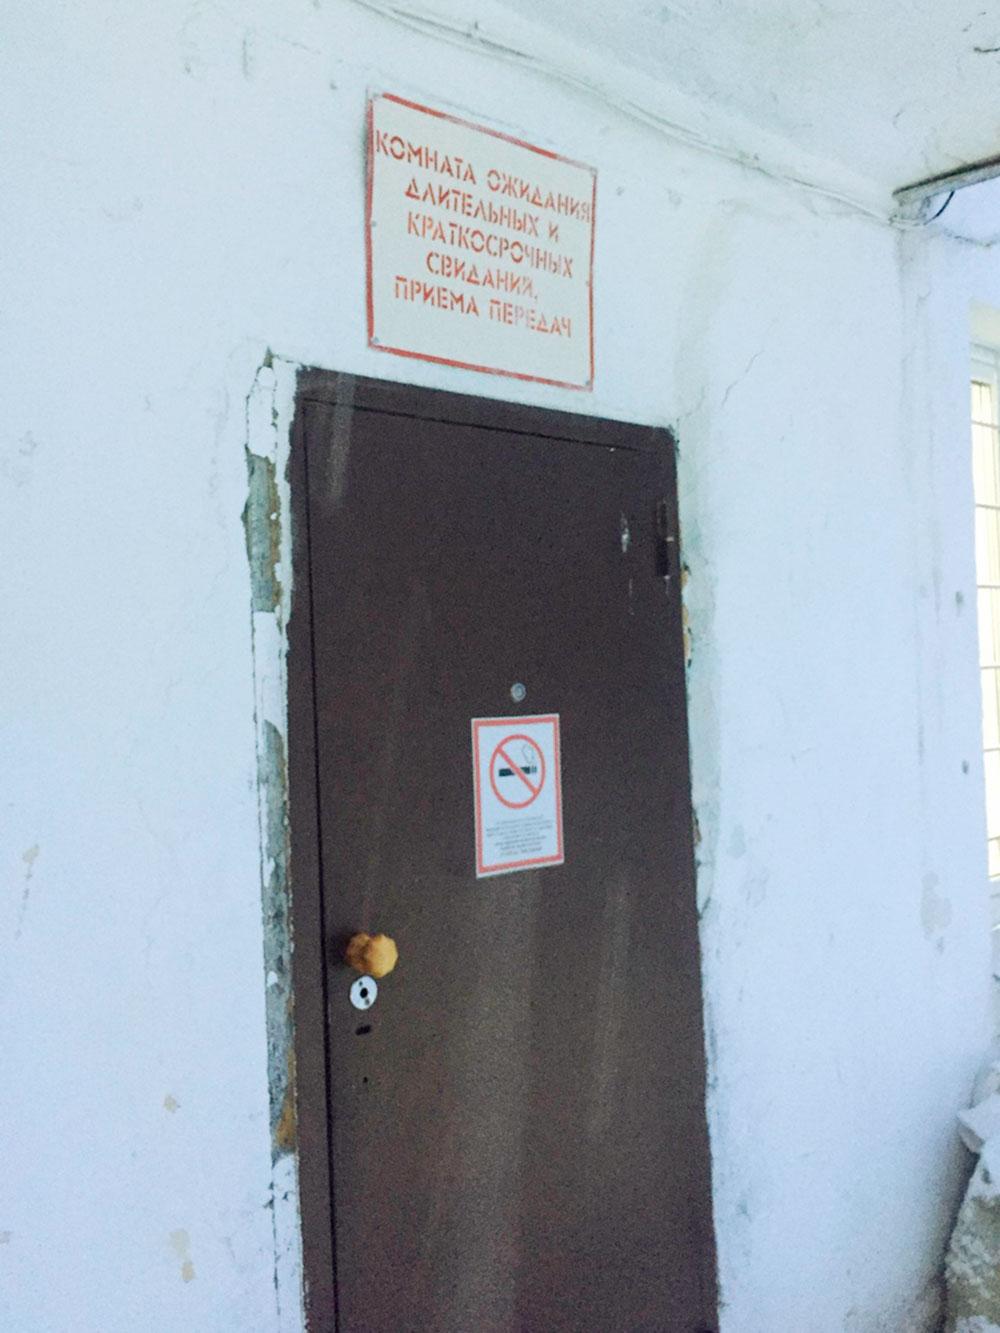 Комната ожидания свиданий и приема передач в ИК-12 поселка Шексна Вологодской области